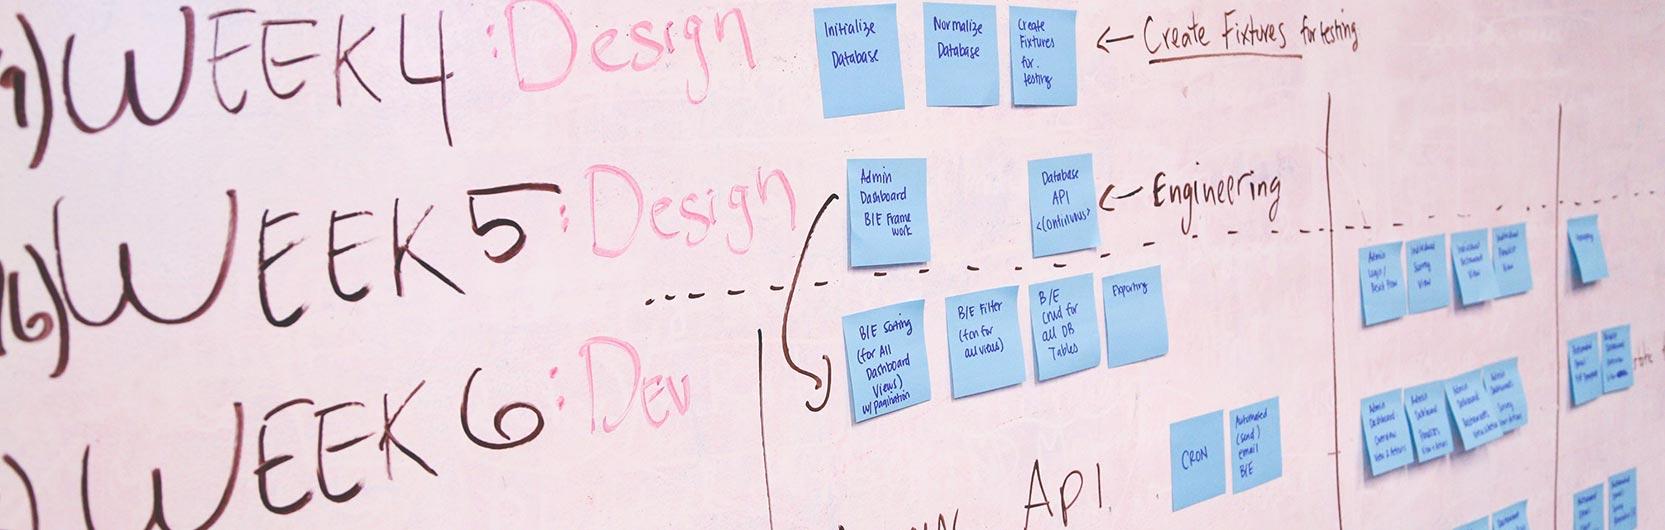 Co-Development Projekte   5-HT Digital Hub Chemistry & Health